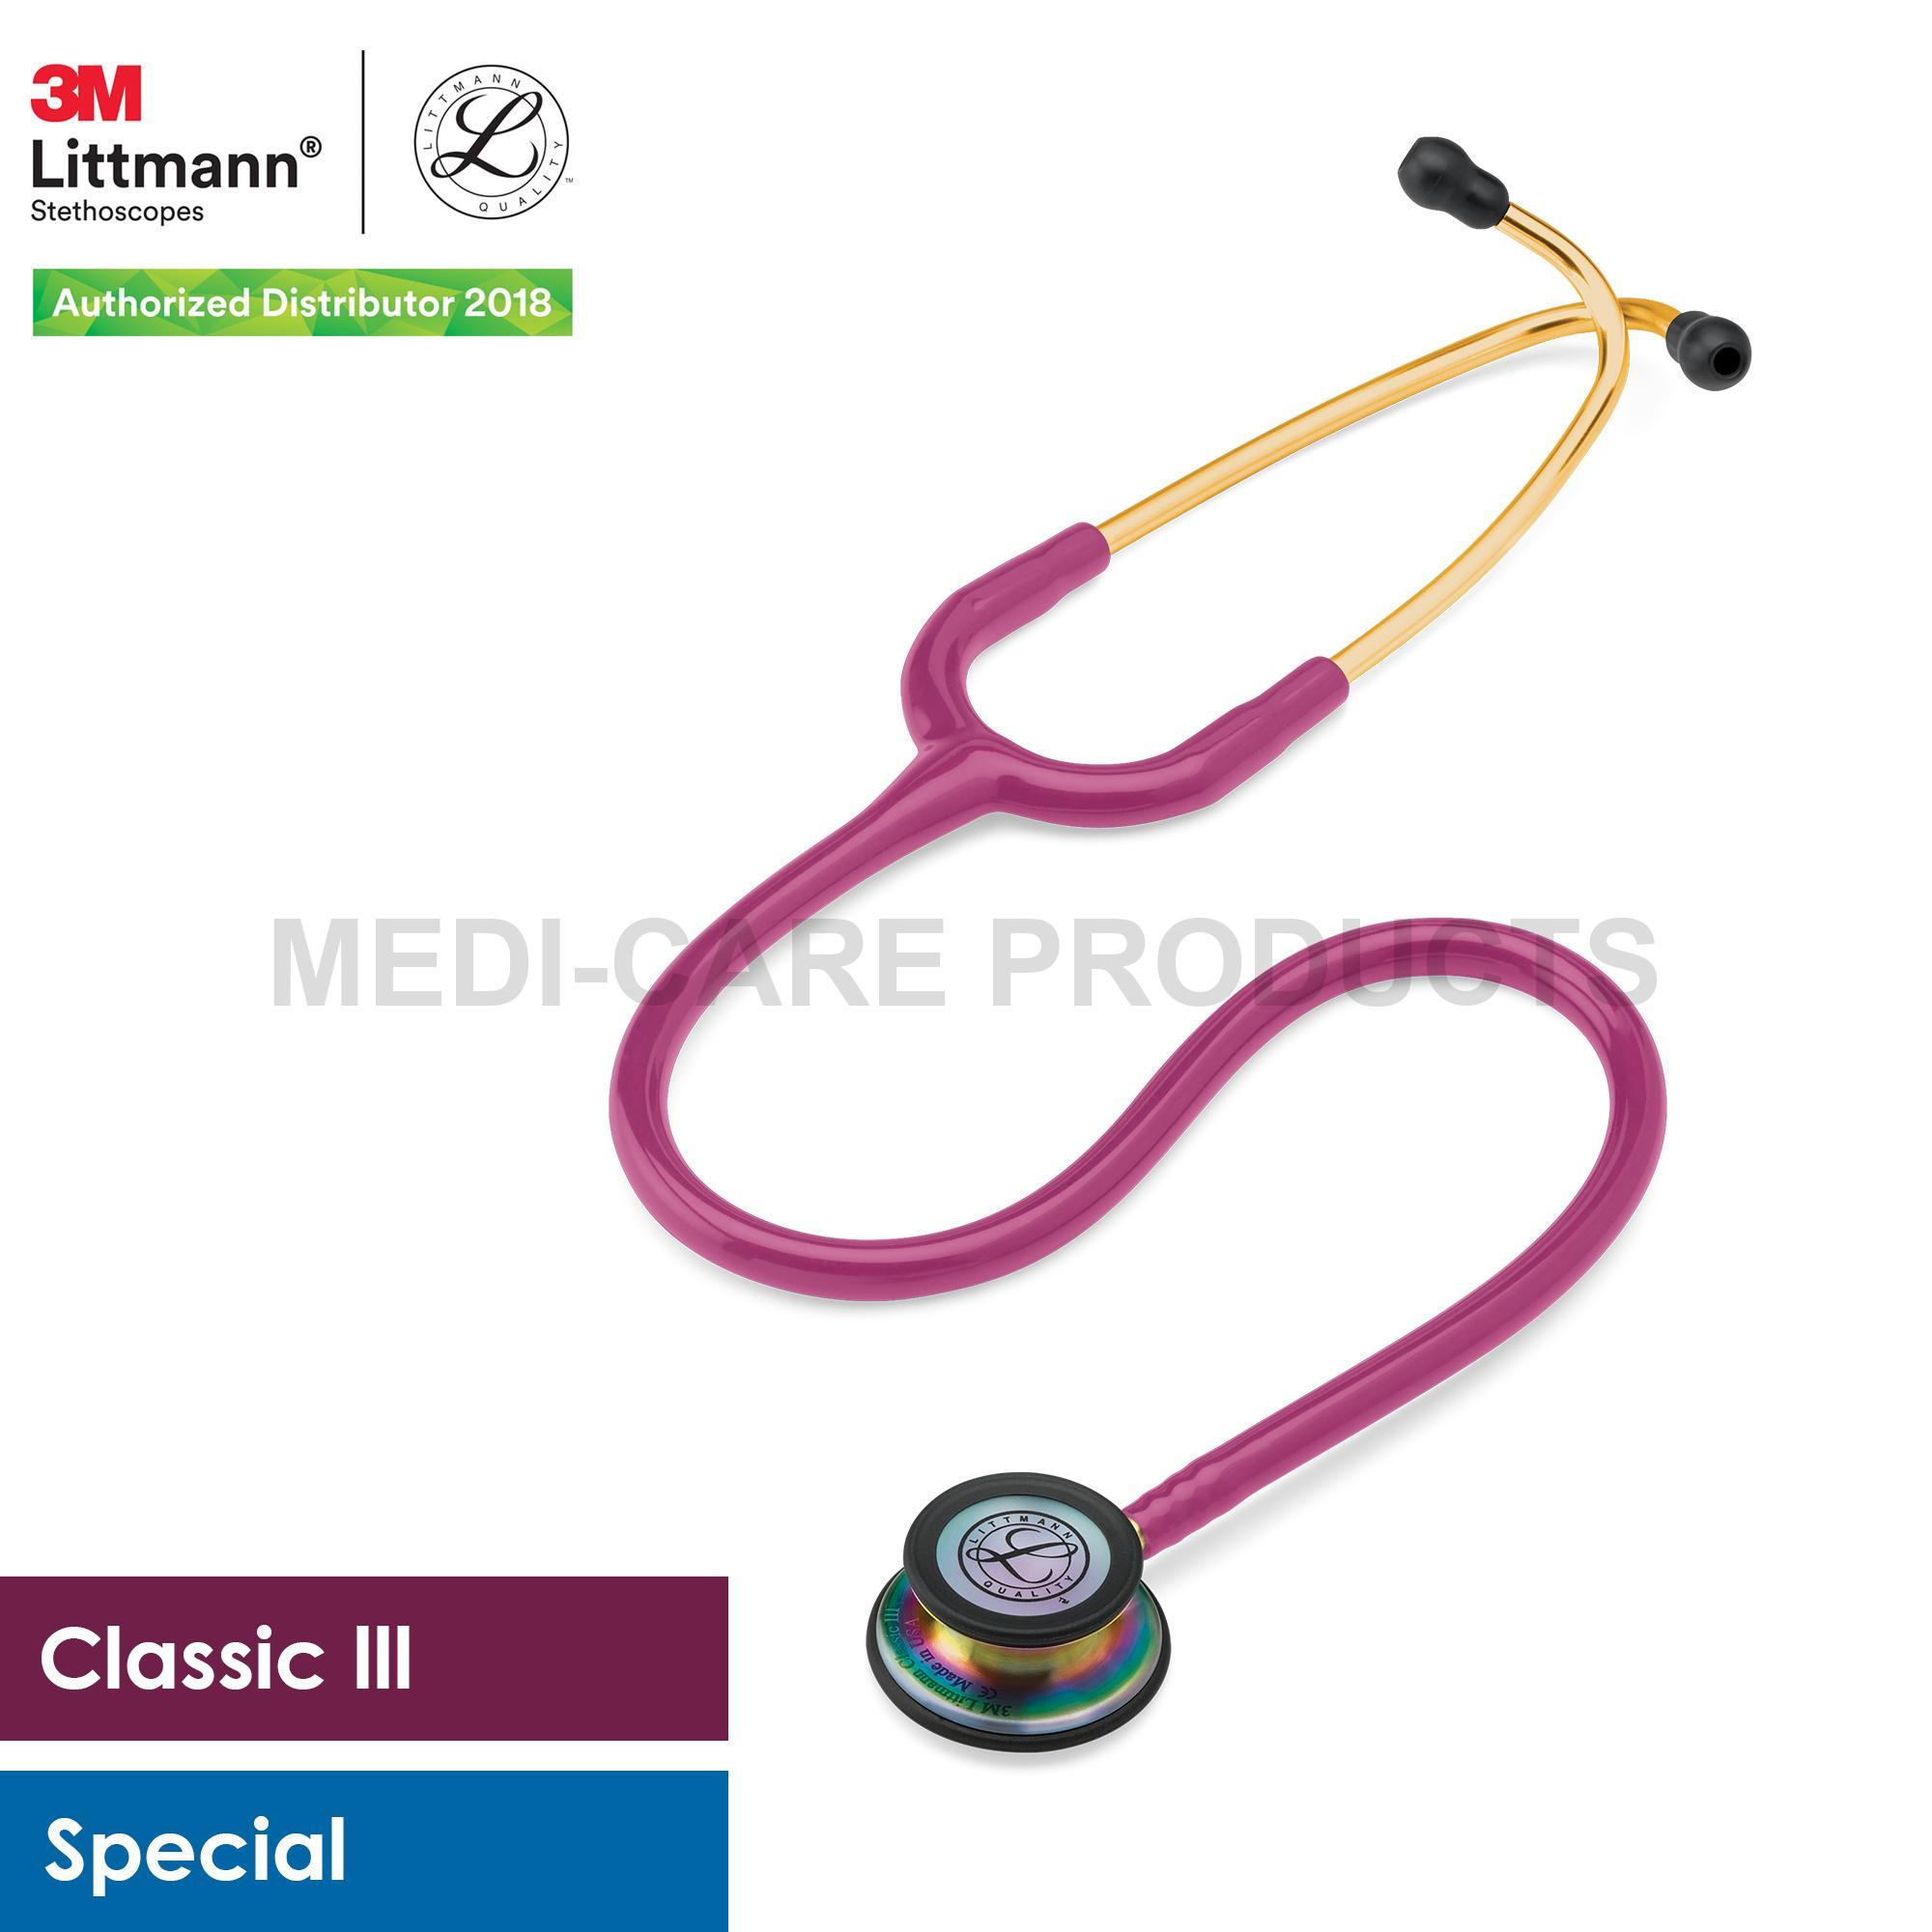 3m littmann philippines 3m littmann price list stethoscope for